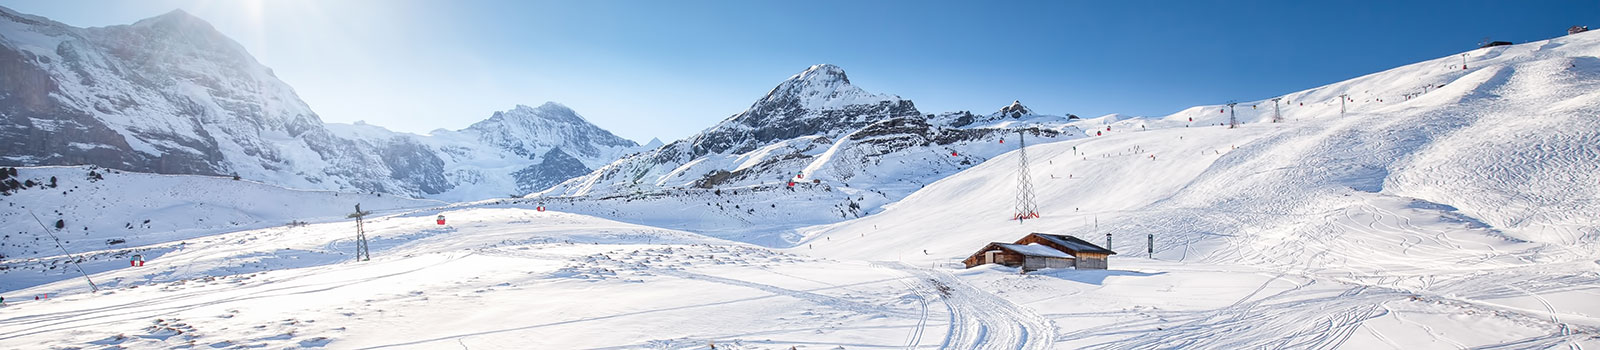 Winter sport in Switzerland